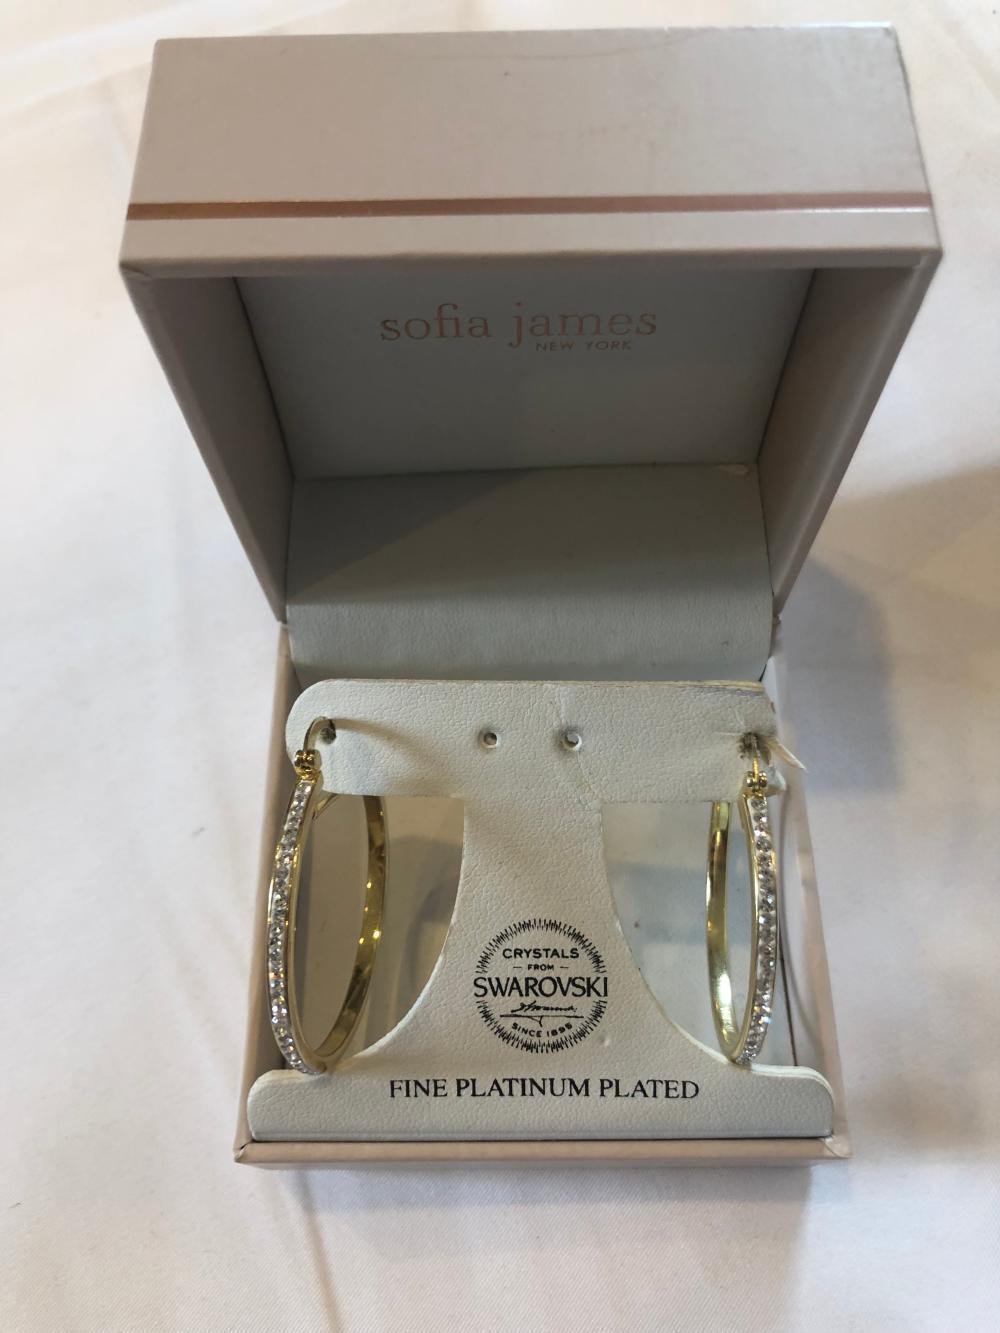 Swarovski Fine Platinum Plated Earrings